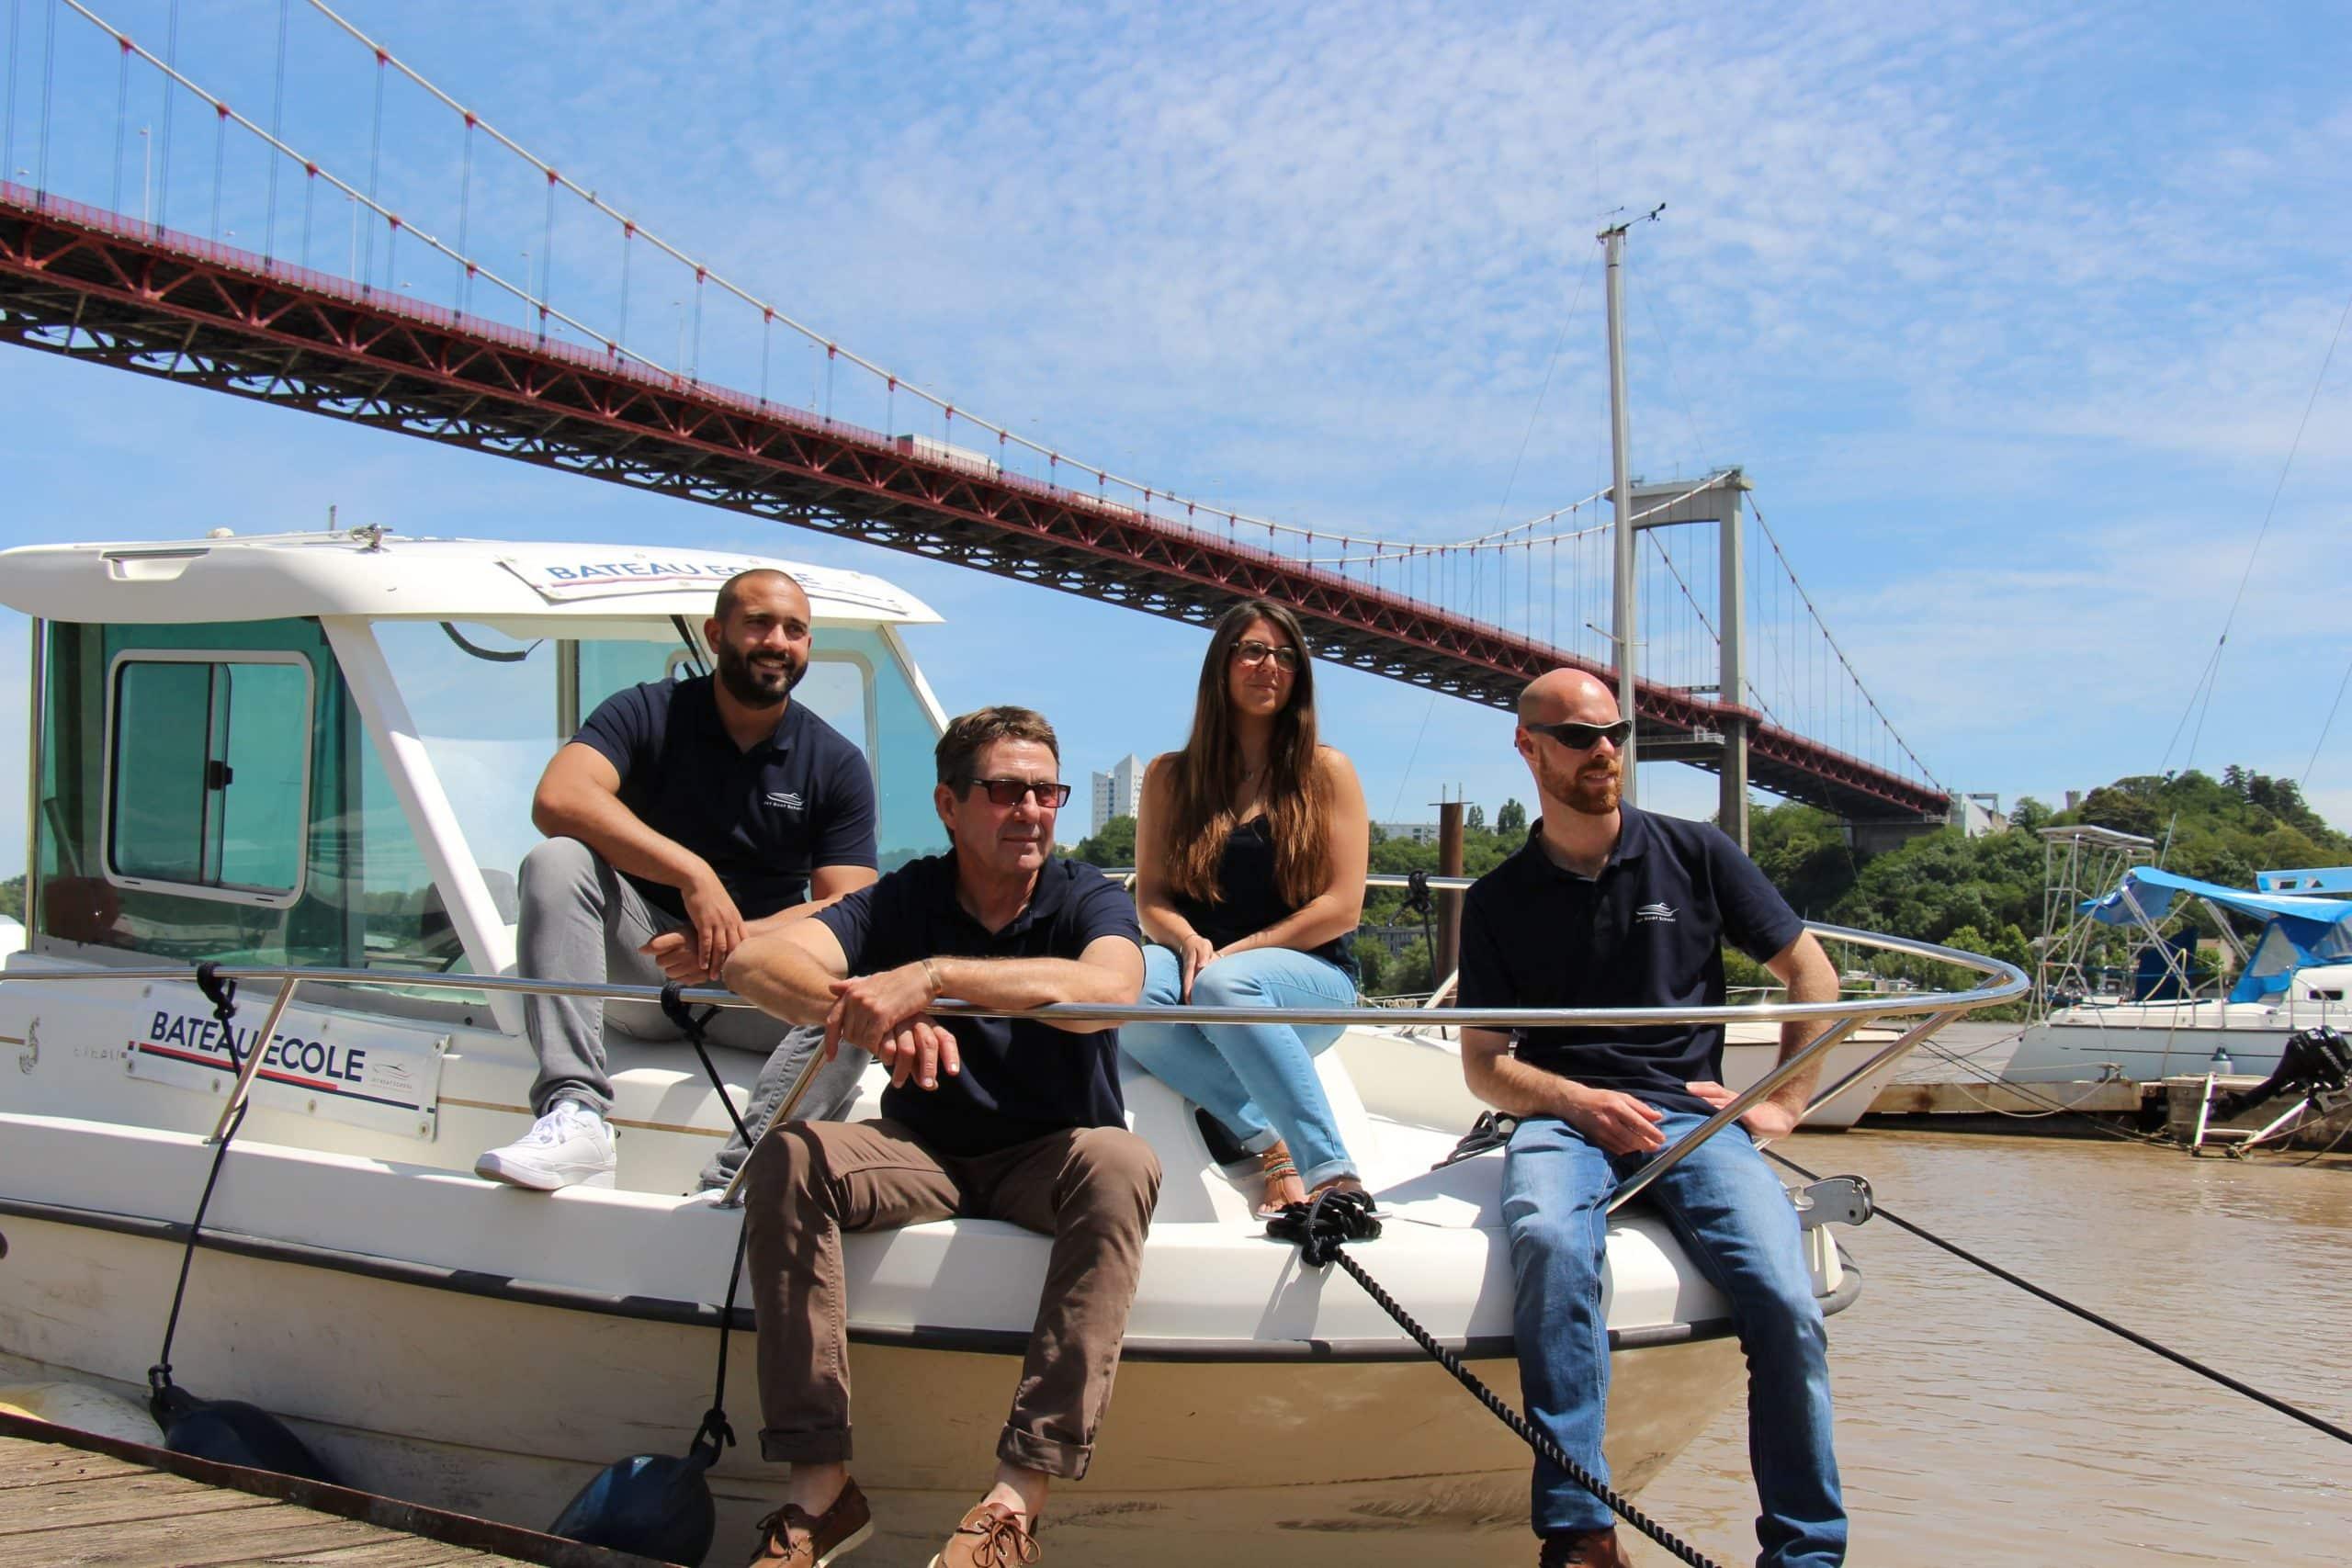 equipe-jet-boat-school